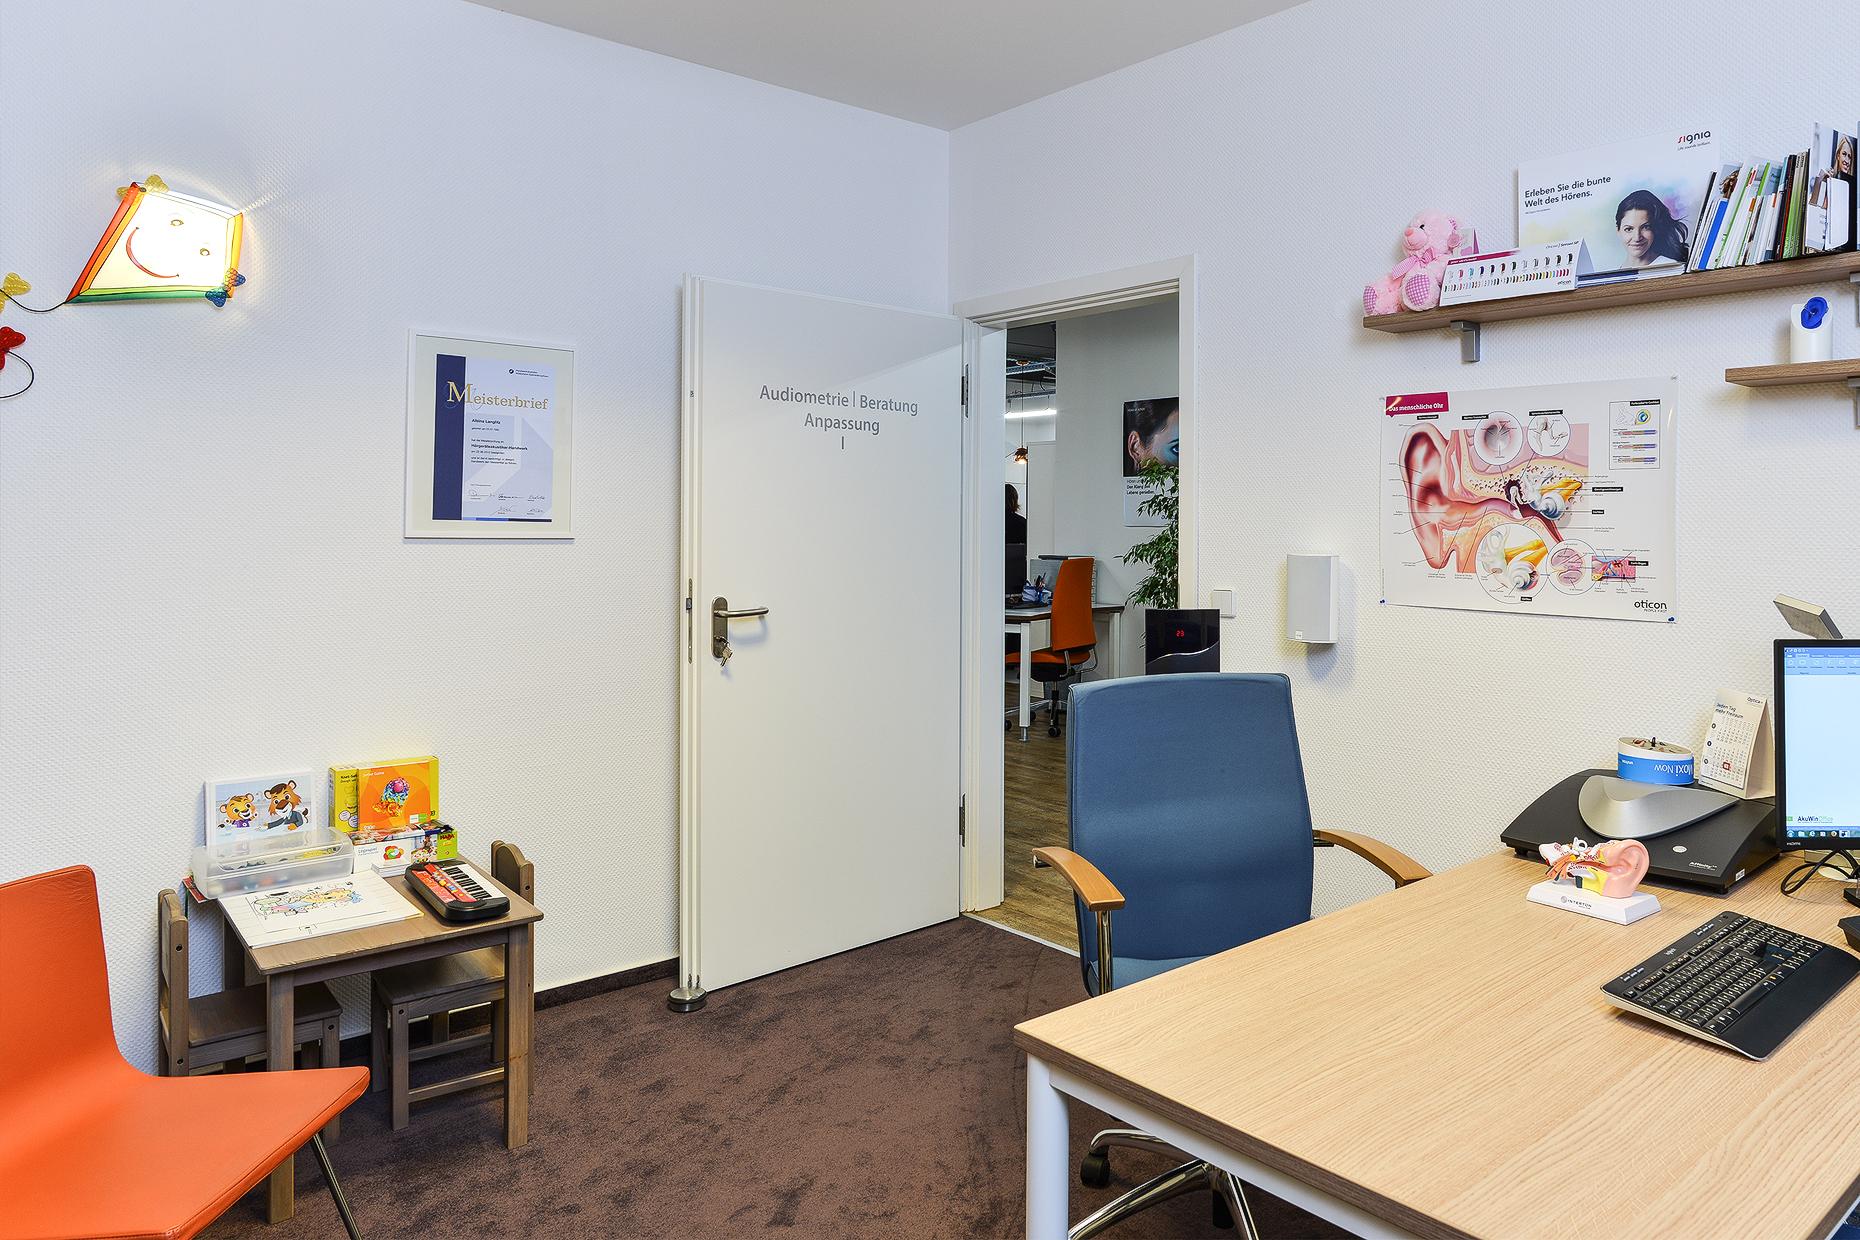 aurrex h rsysteme berlin gmbh co kg berlin kontaktieren. Black Bedroom Furniture Sets. Home Design Ideas